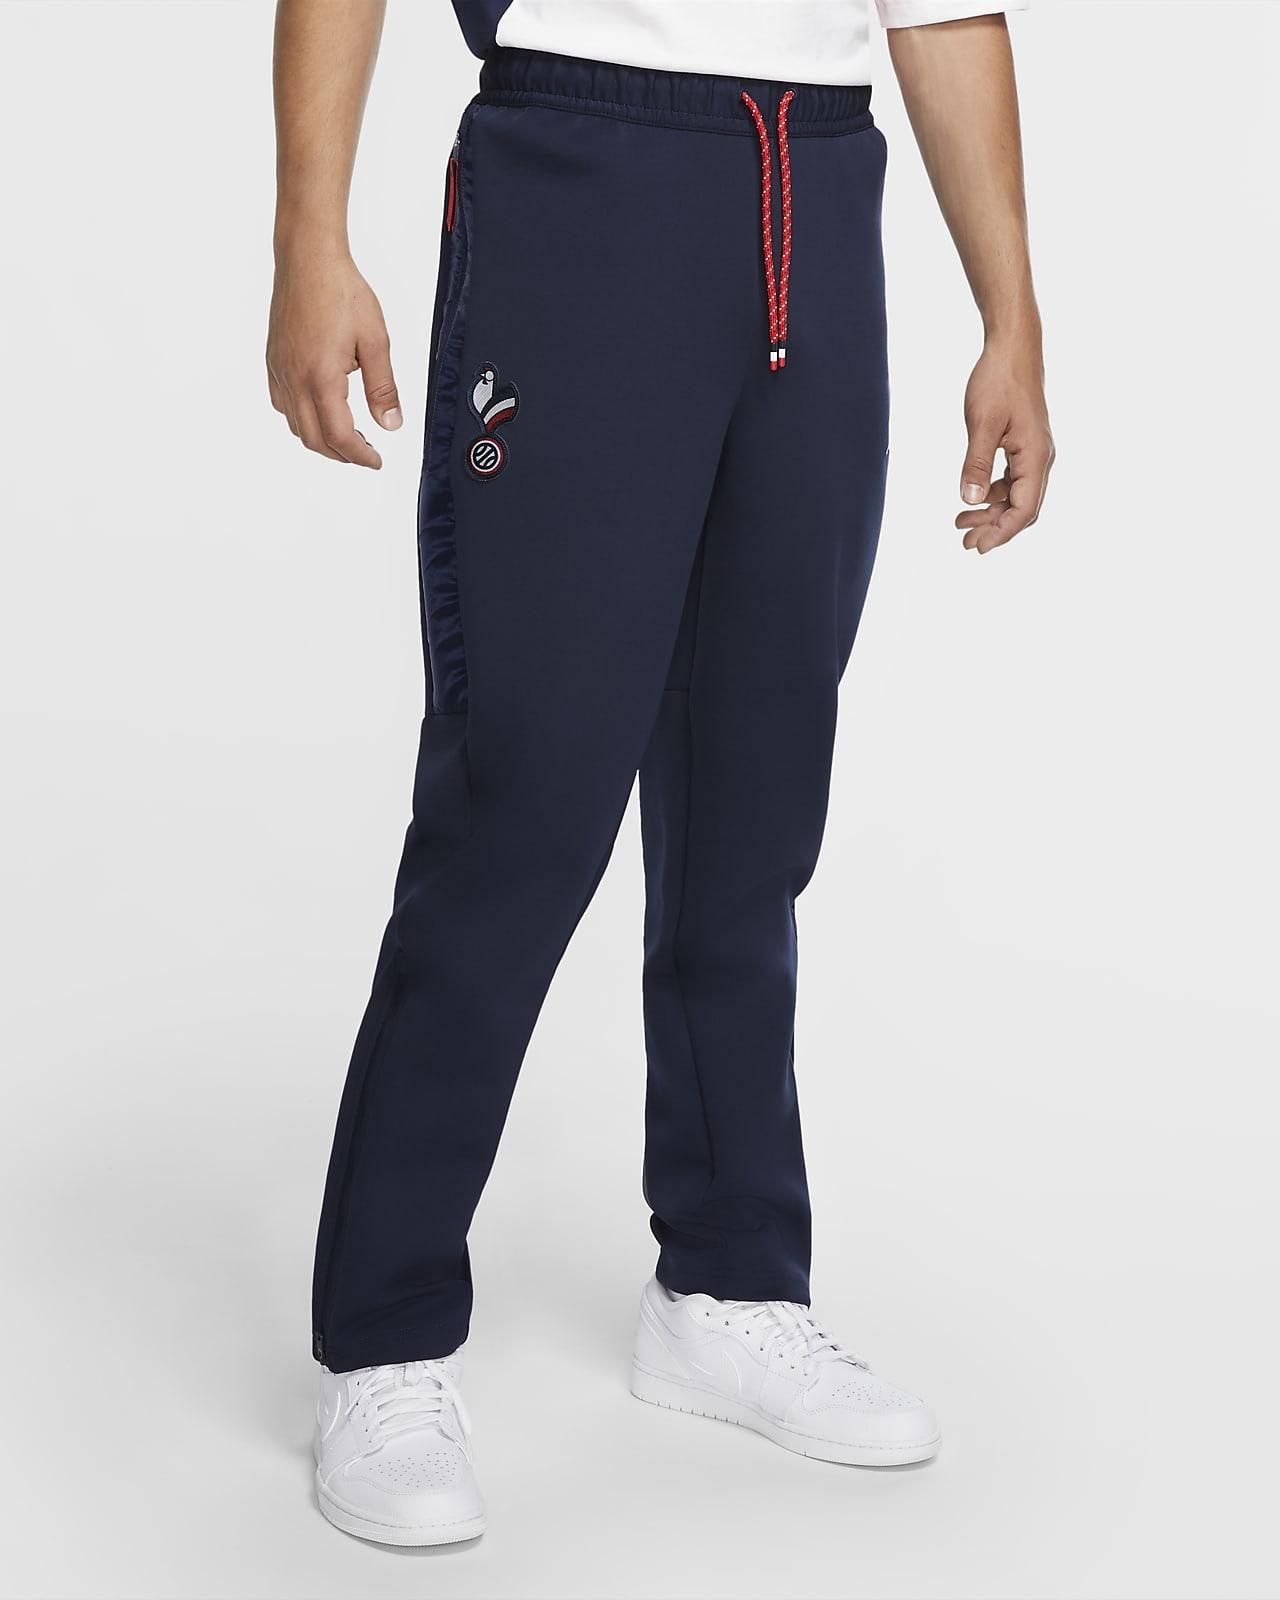 France Jordan Men's Game Pants